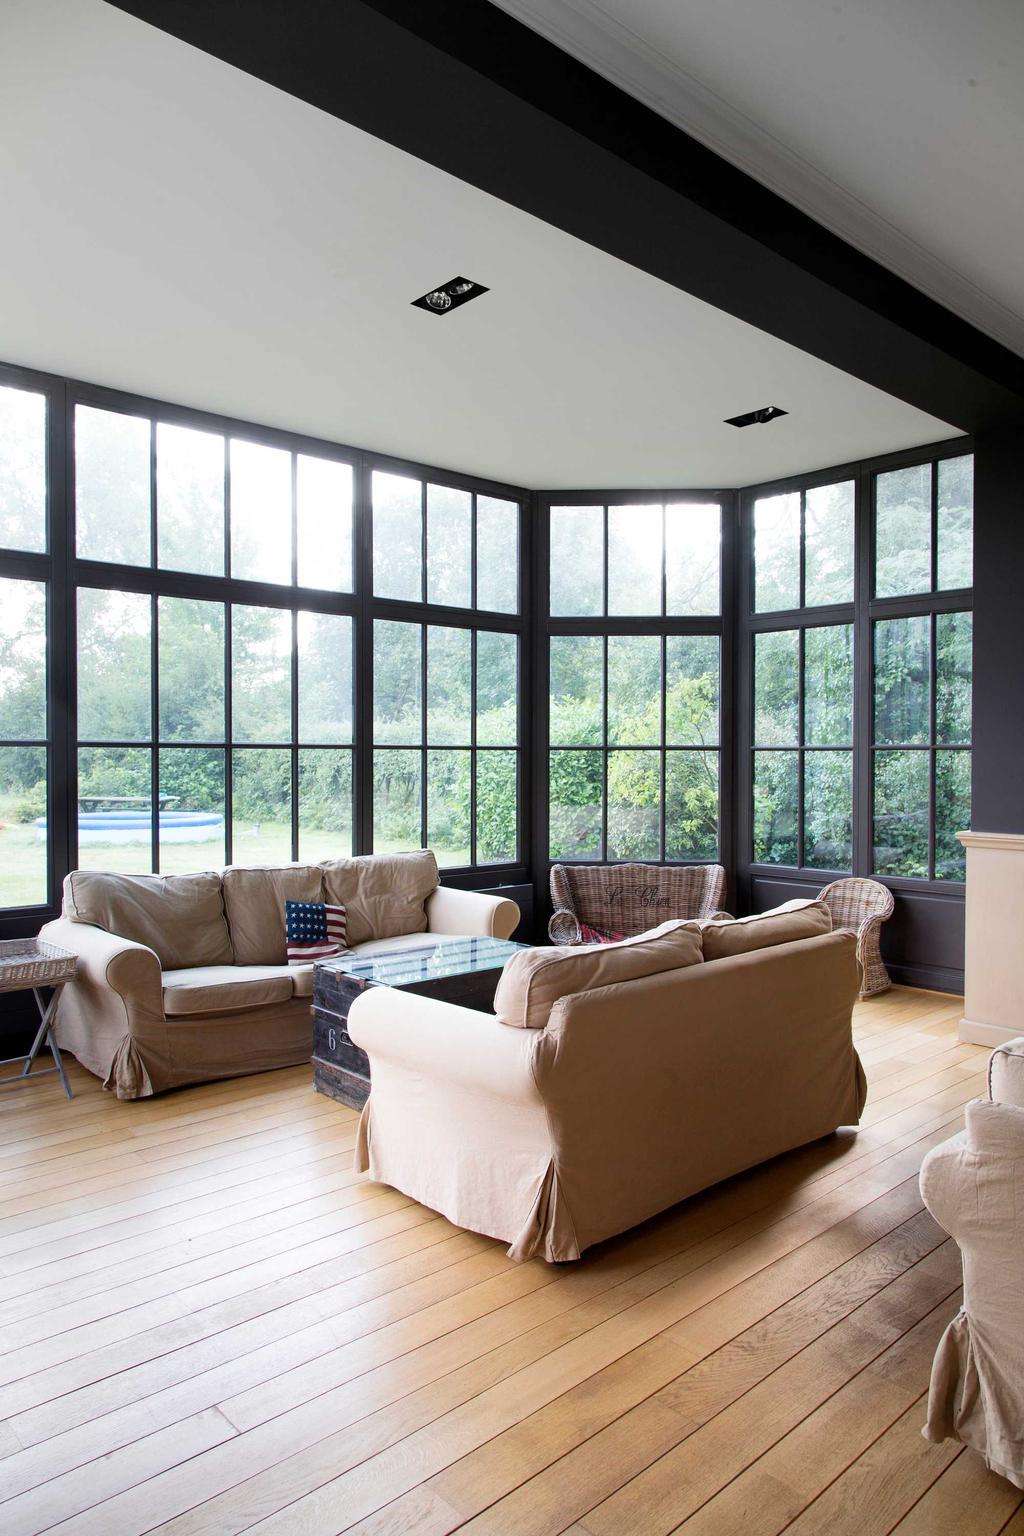 baie vitree beige noire